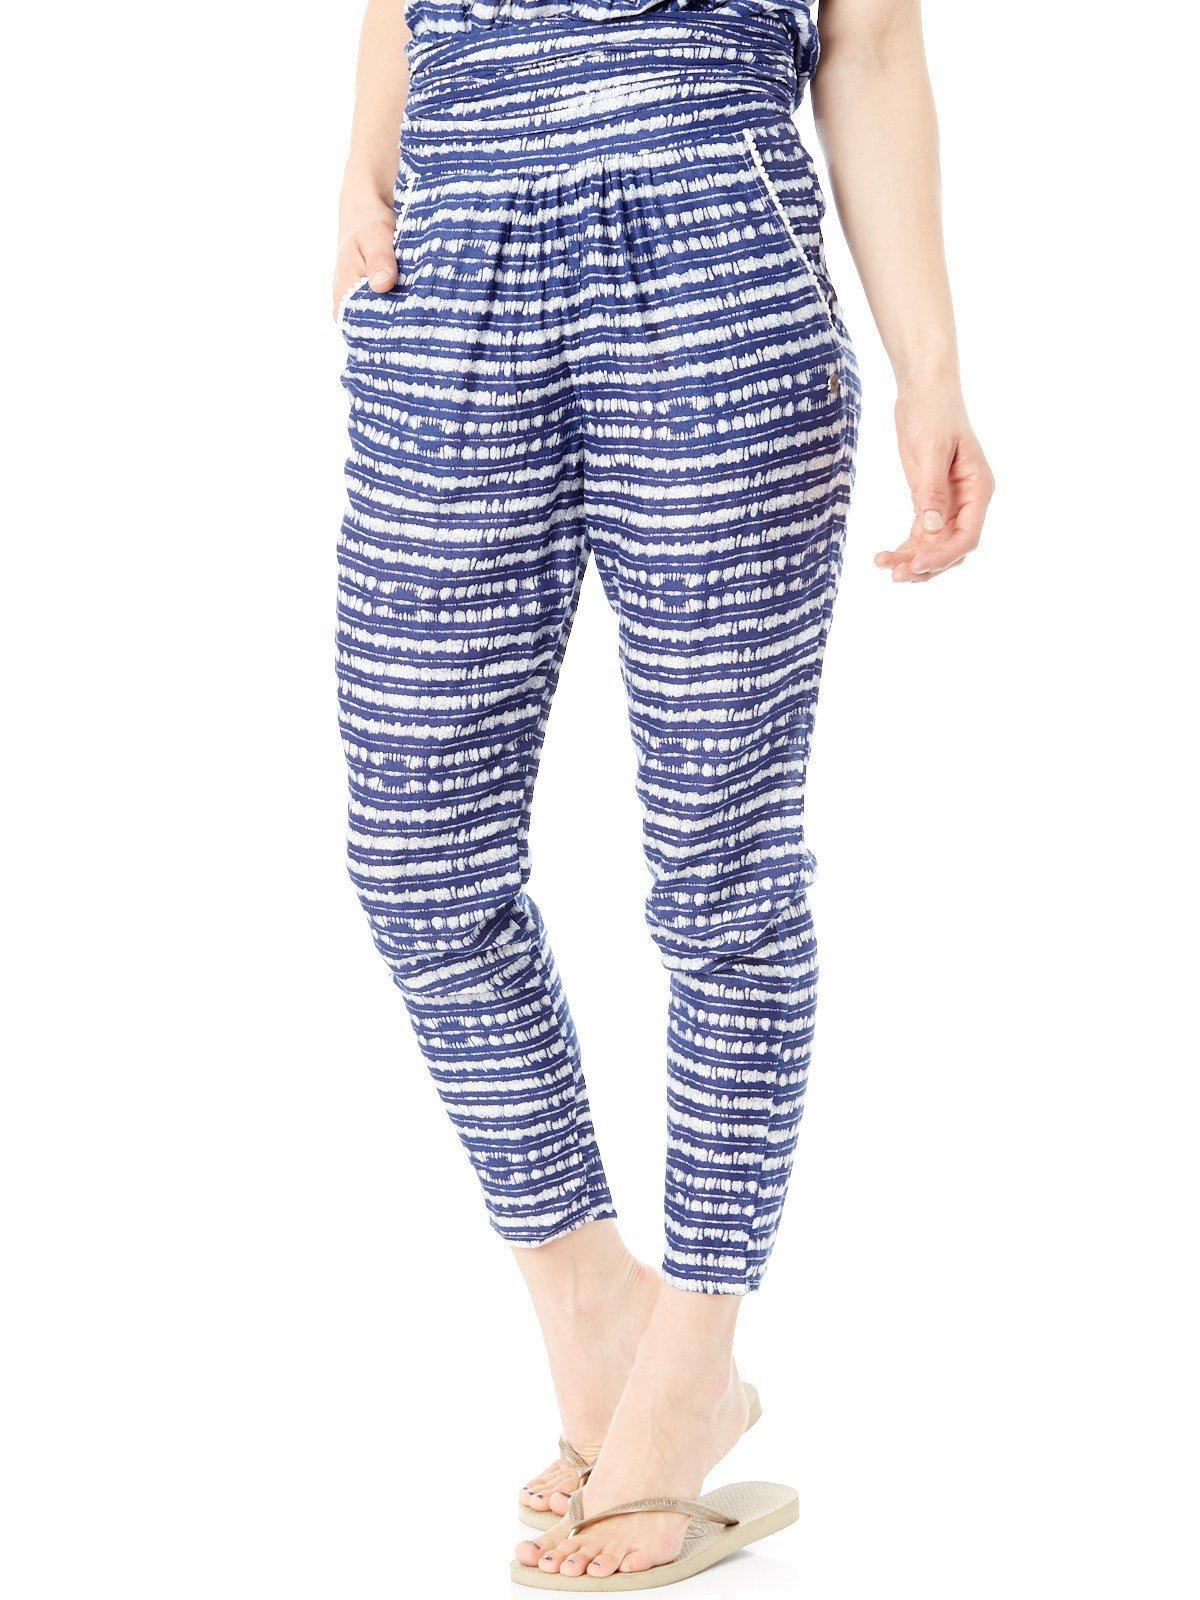 Roxy Ultra Violet Printed – Pantalones De Playa para Mujer ERJNP03093